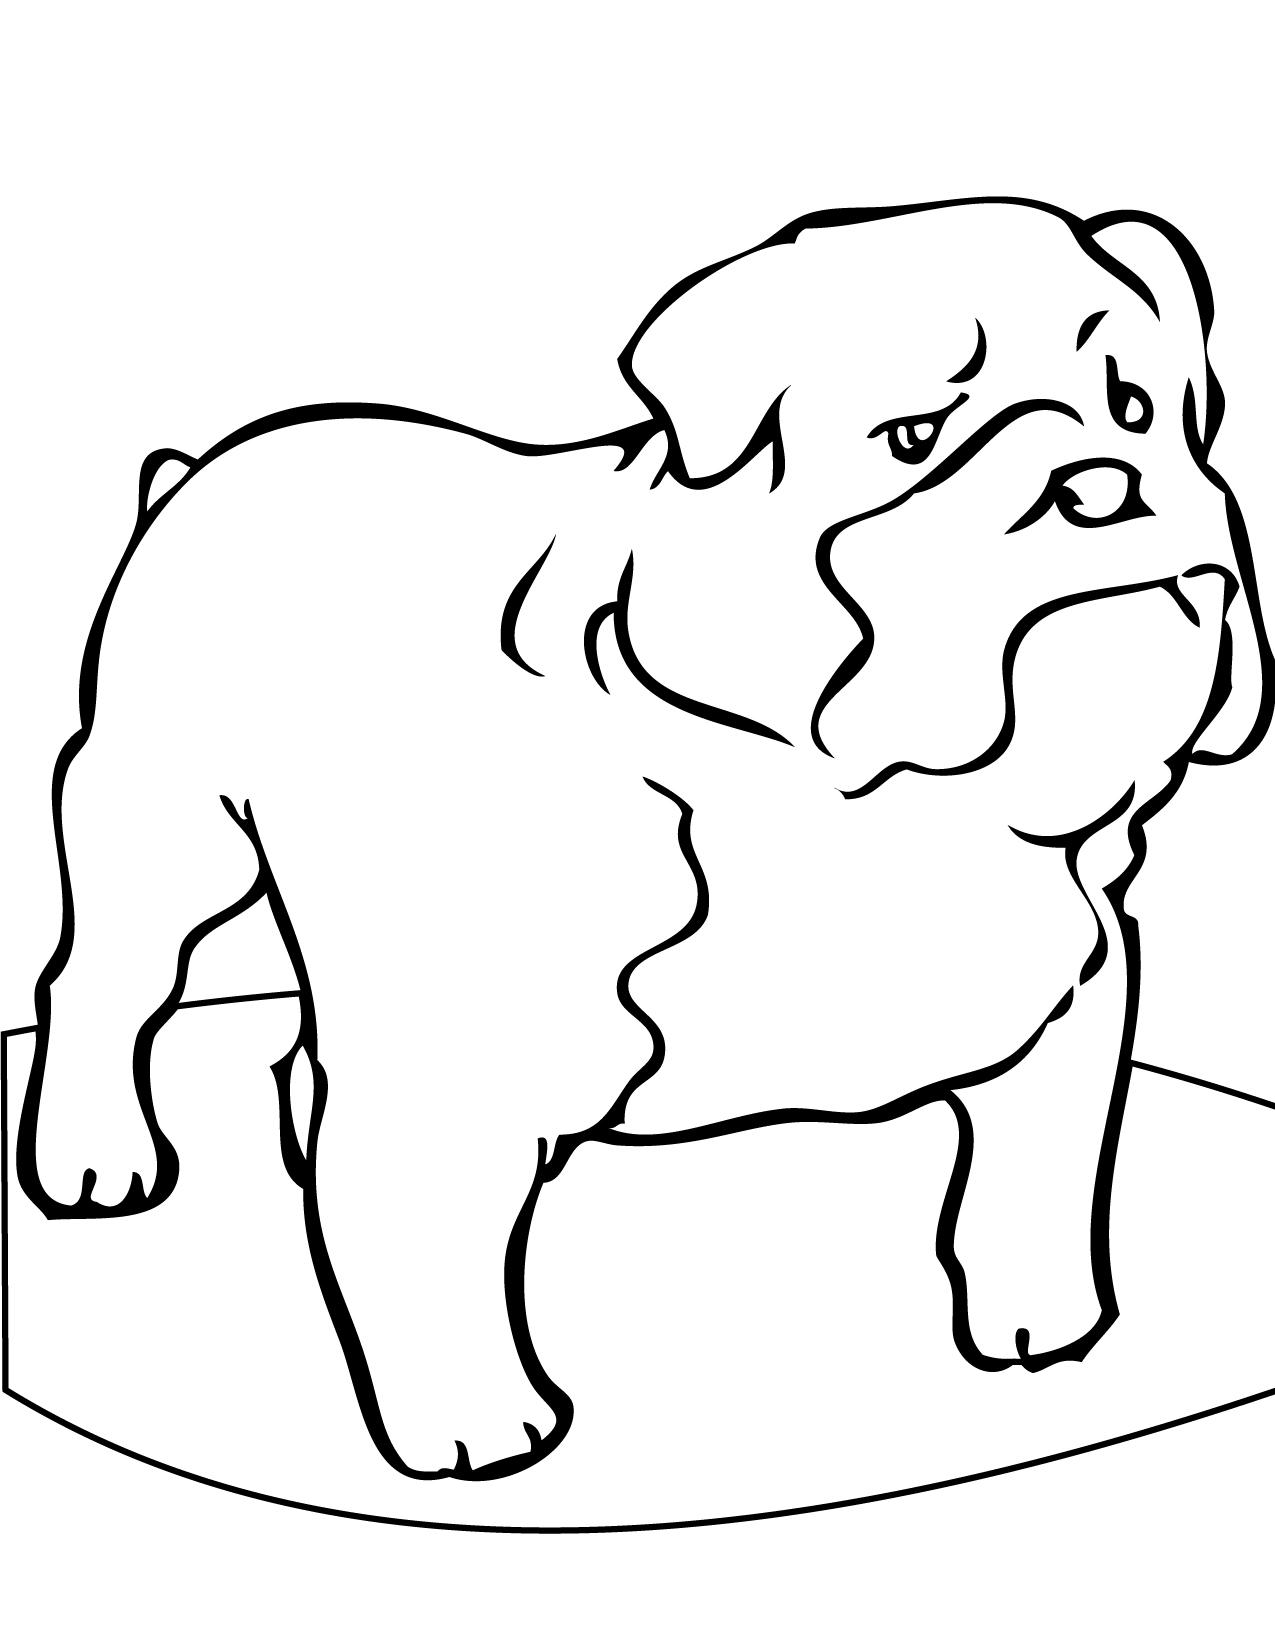 bulldog coloring book pages - photo#36